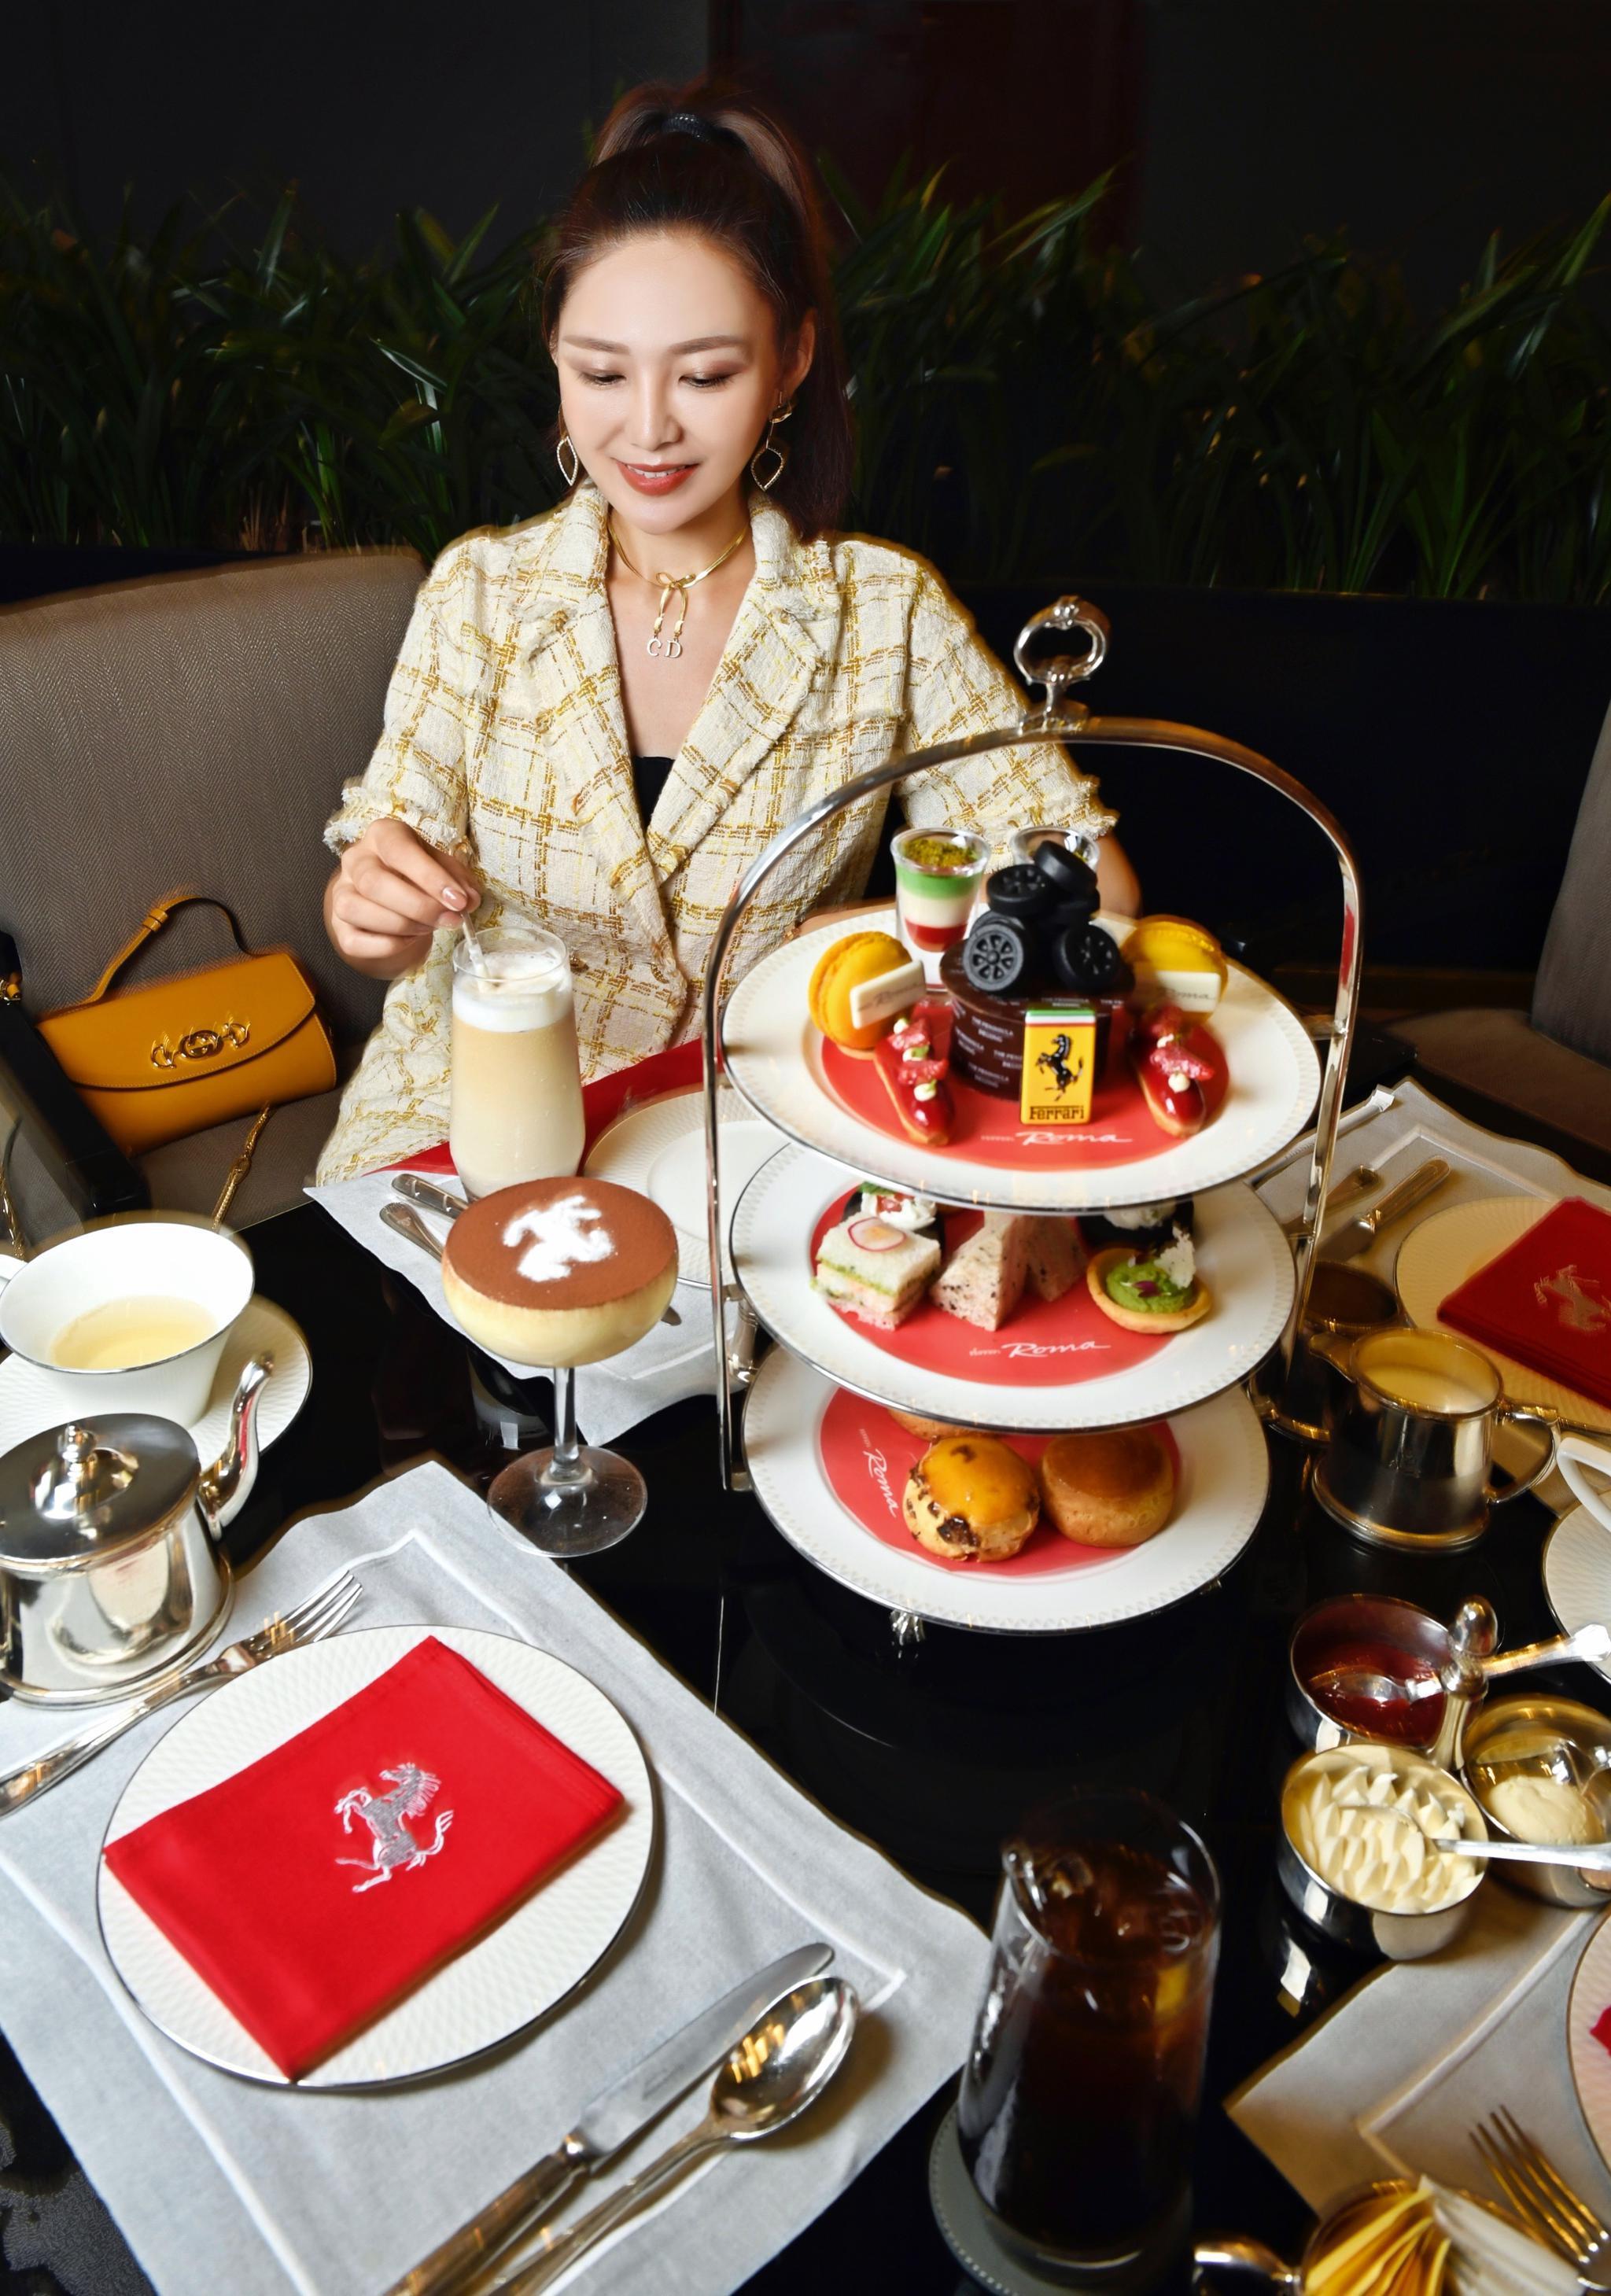 Ferrari 联手ThePeninsula推出的王府半岛法拉利罗马下午茶☕️